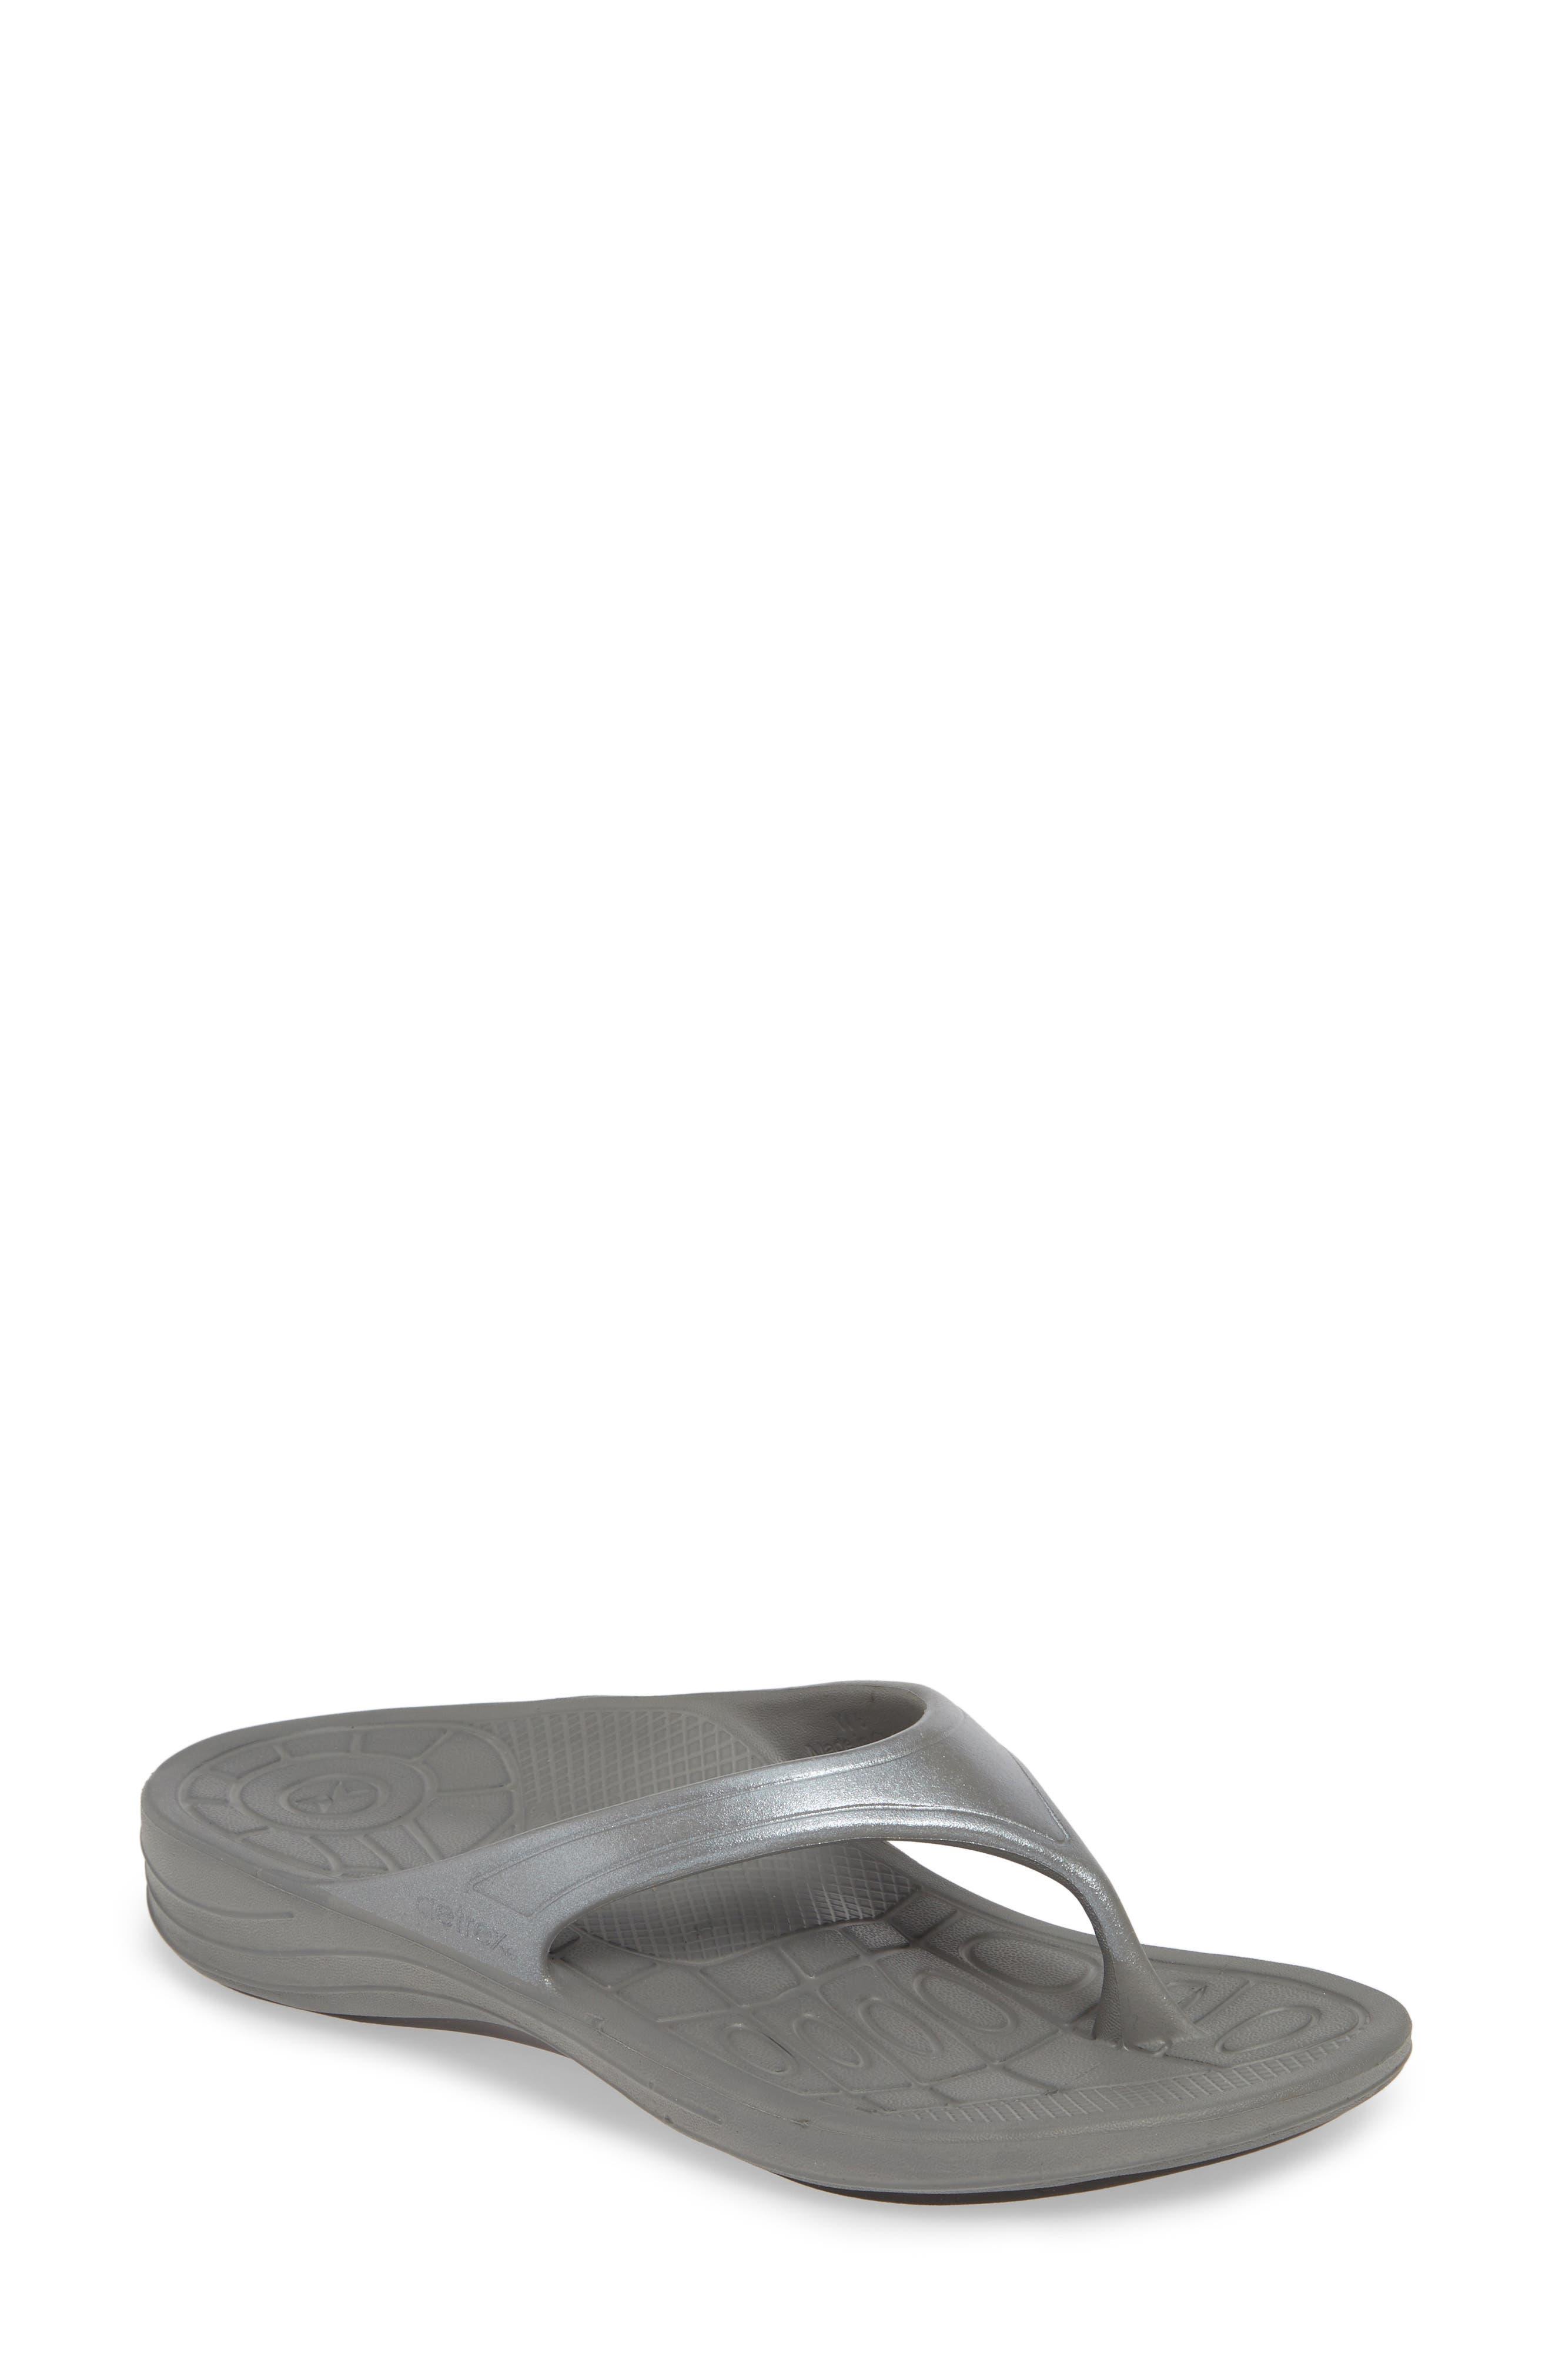 Aetrex Fiji Flip Flop, Grey